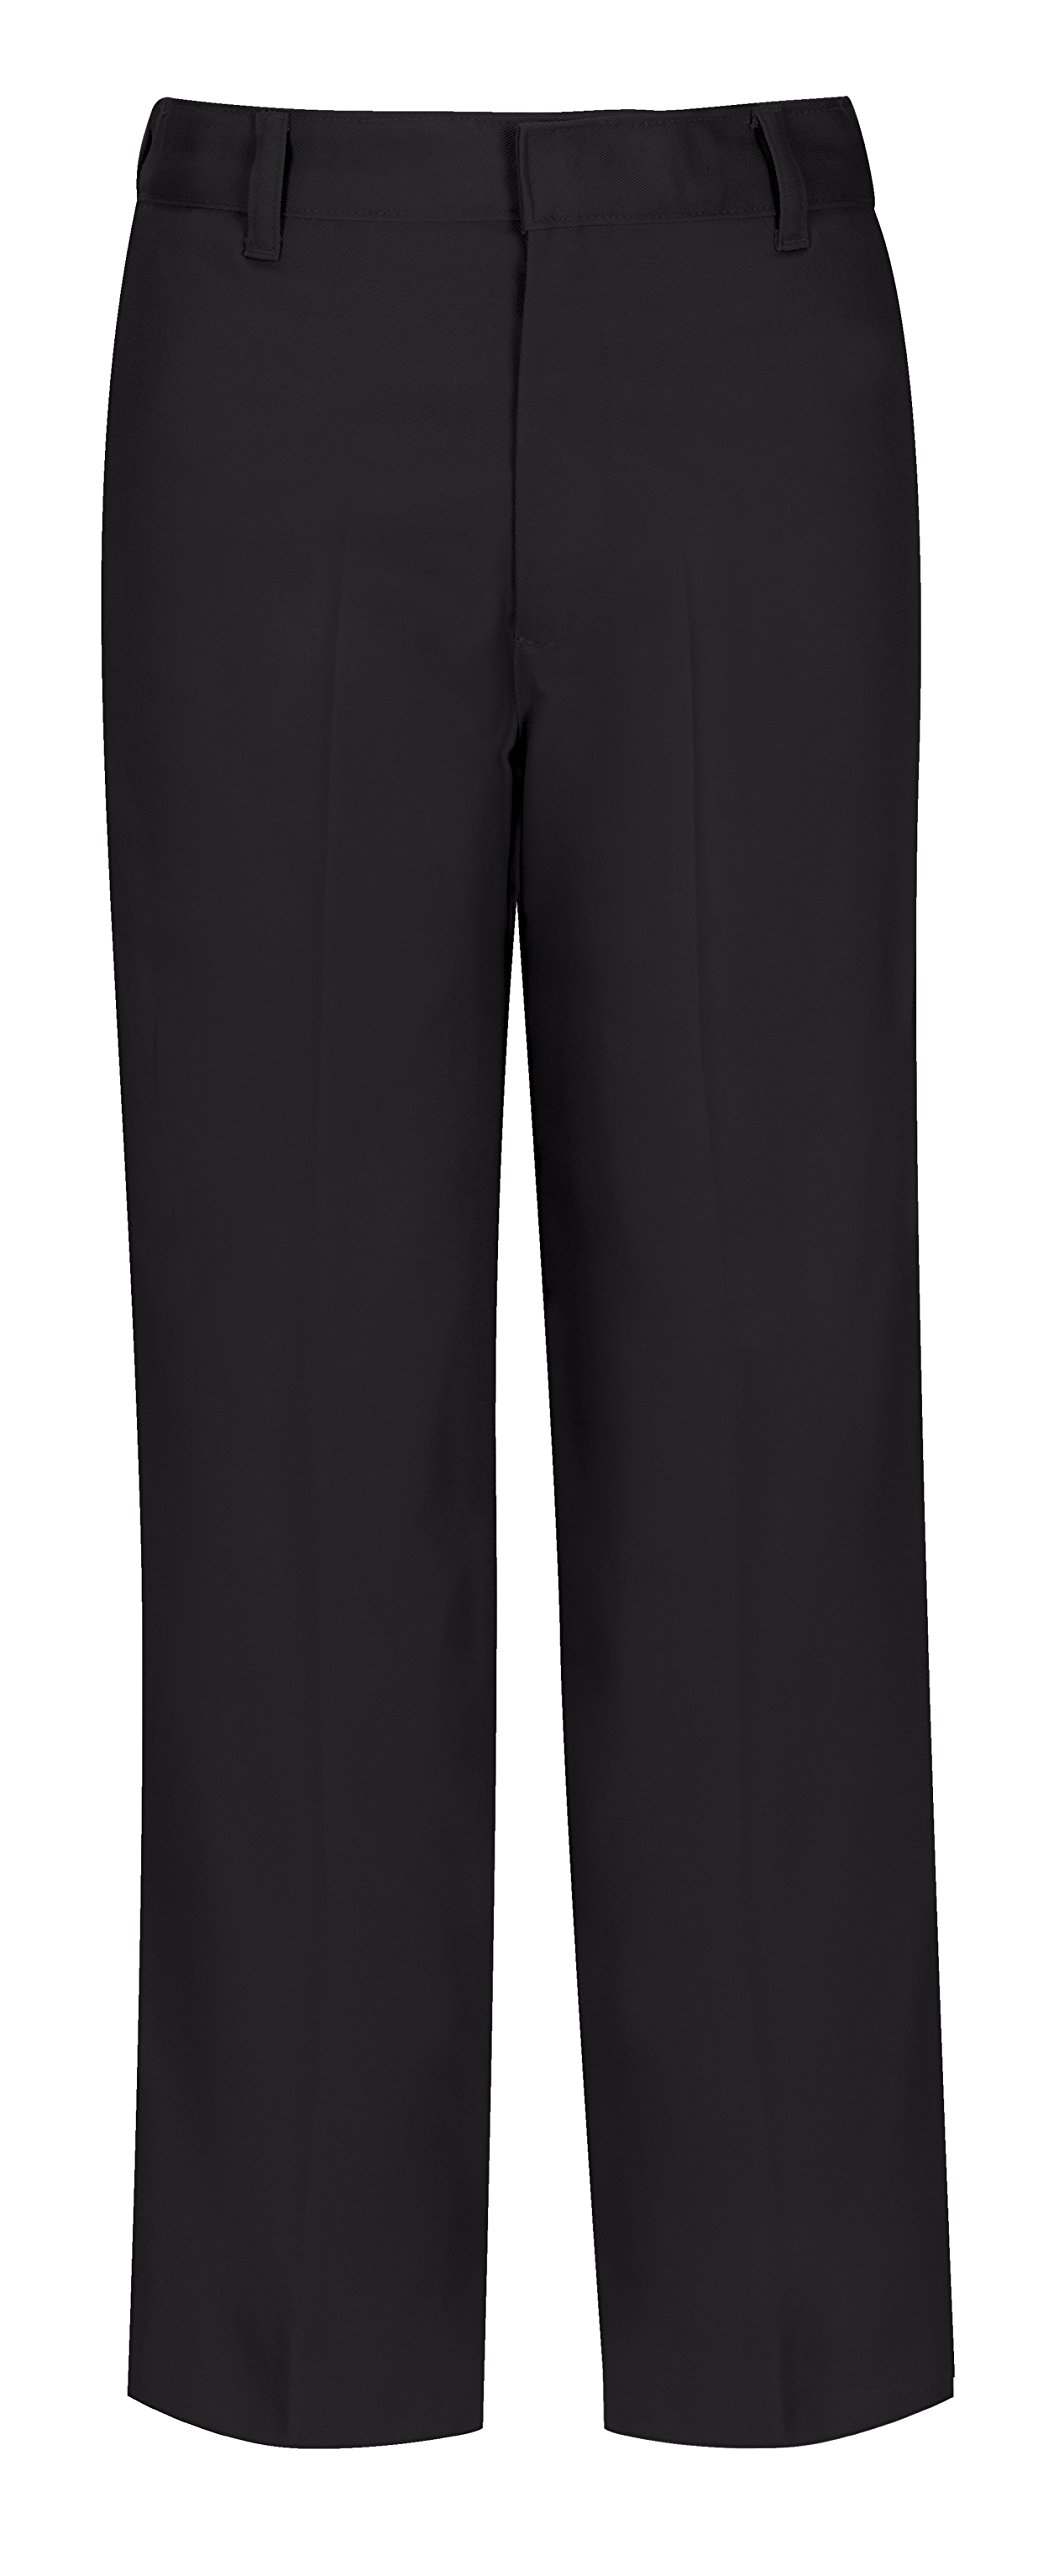 CLASSROOM Big Boys' Husky Flat Front Pant, Black, 20H